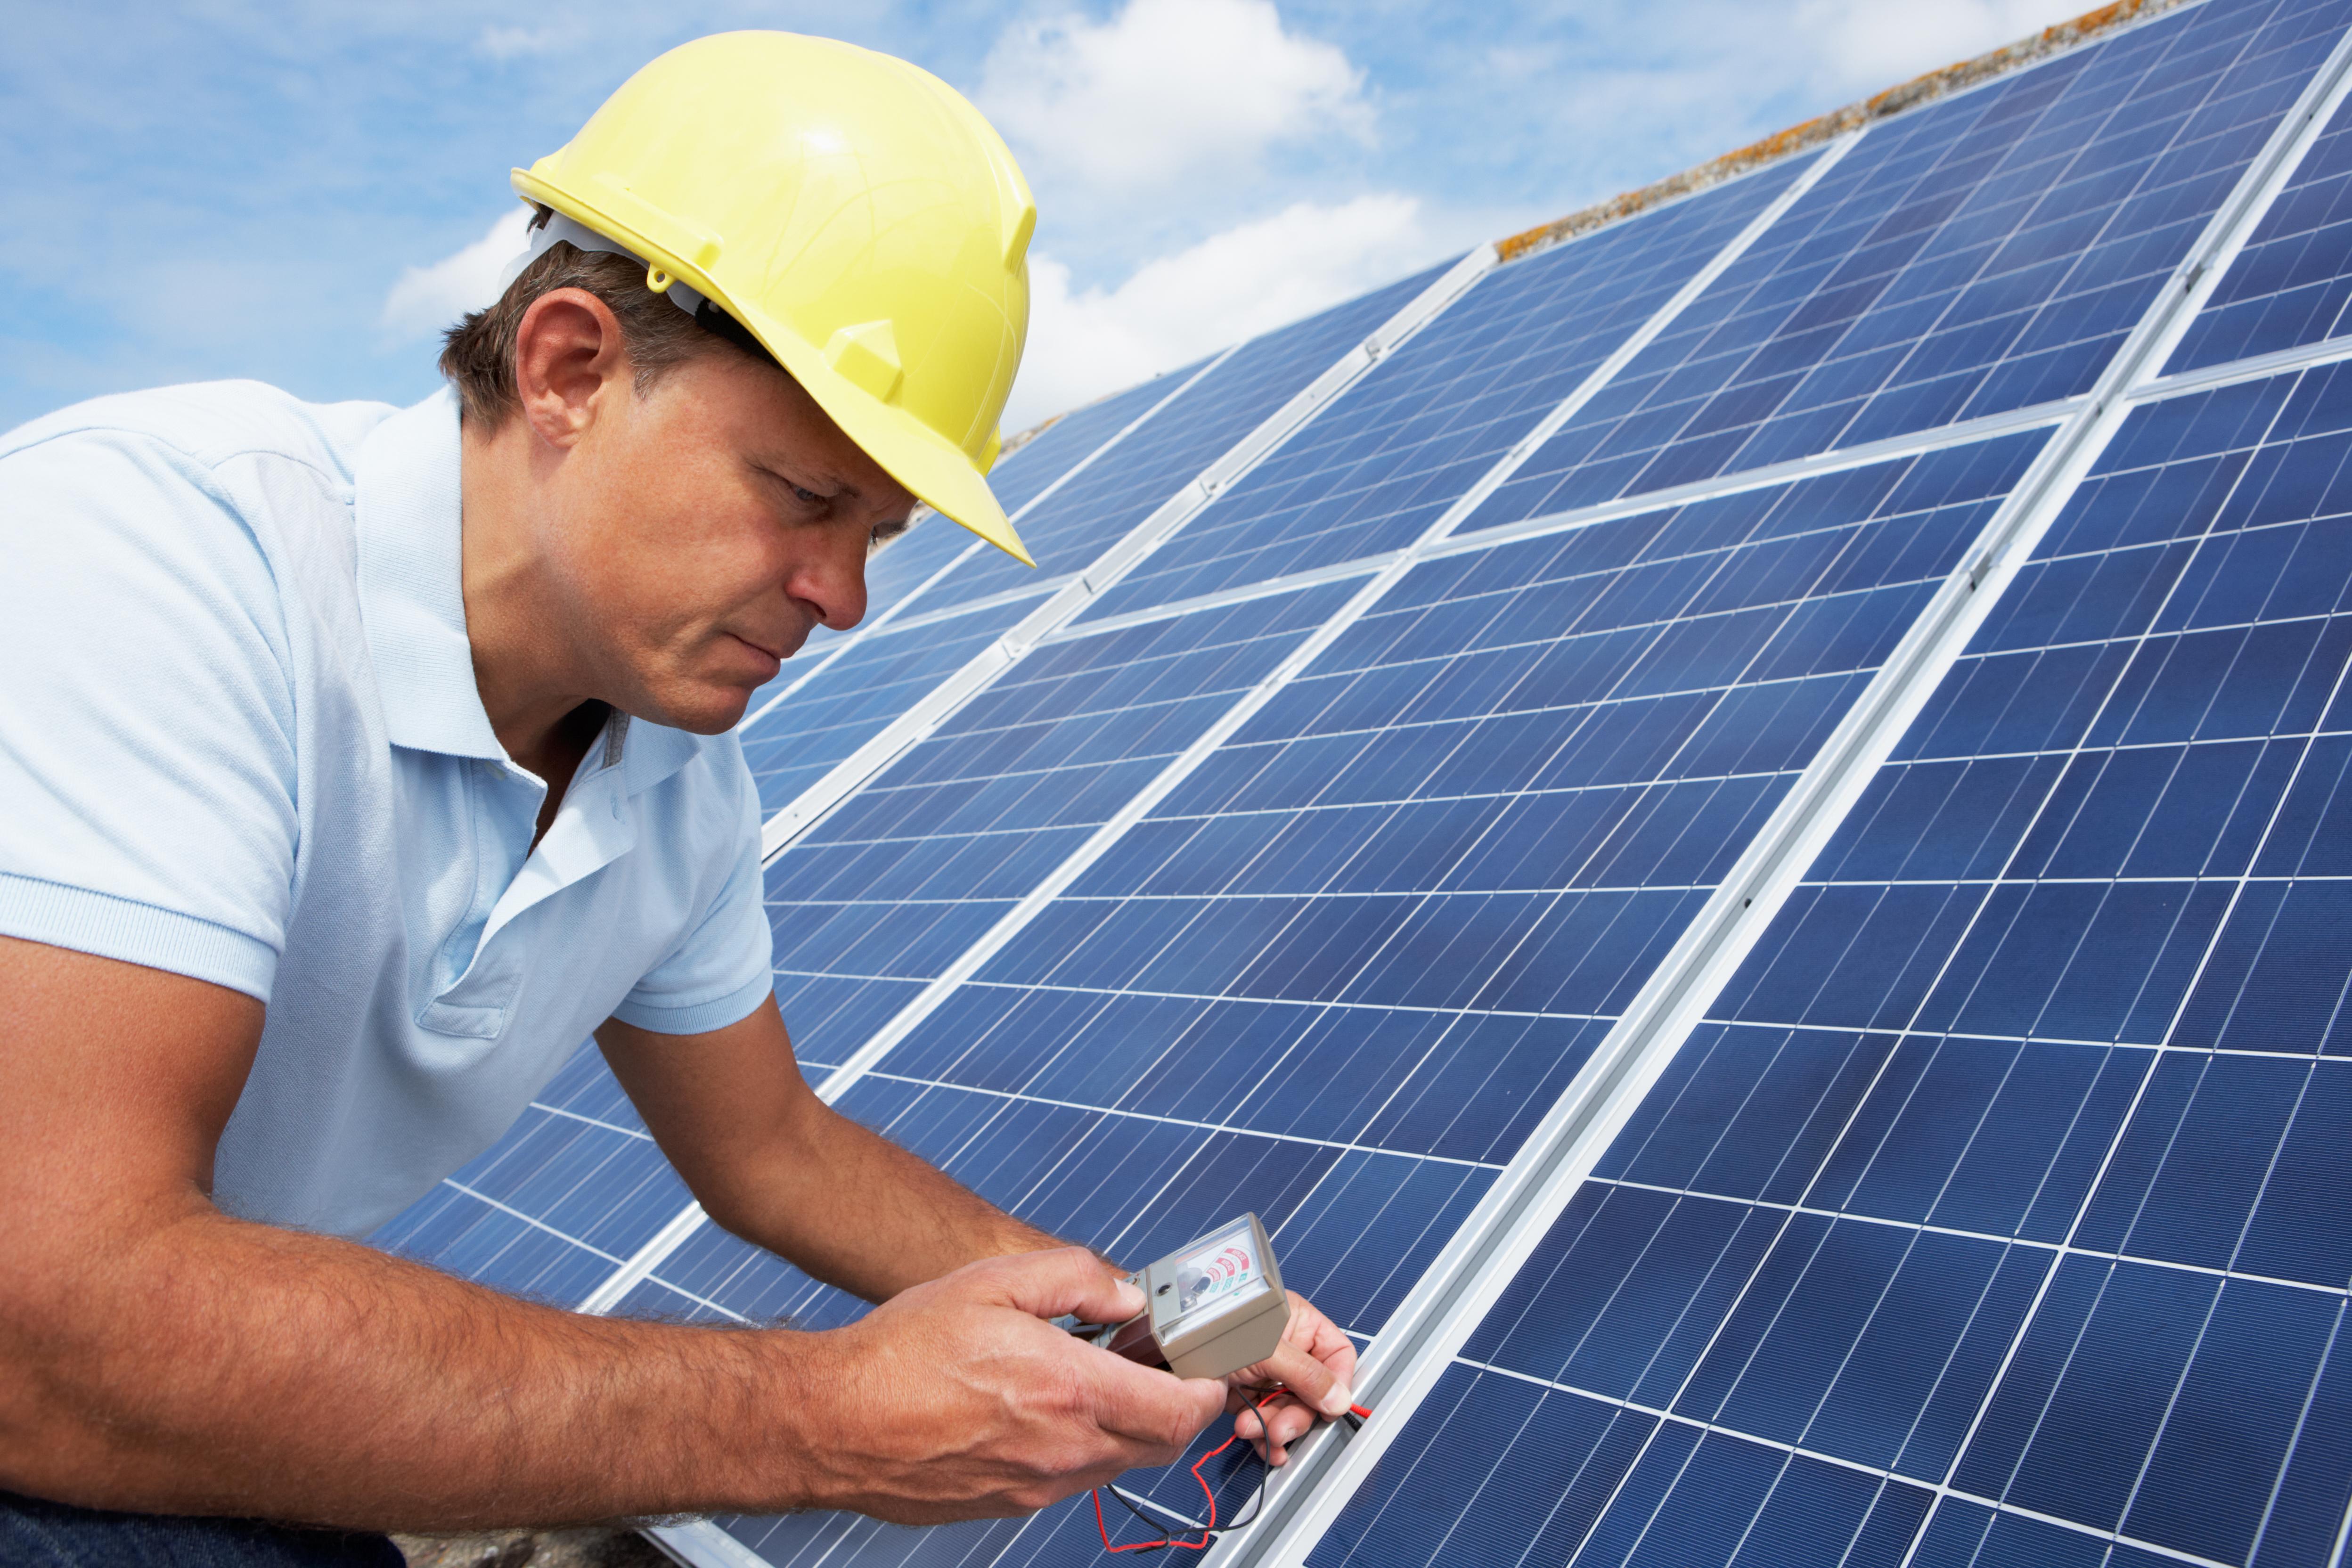 Man wearing hard hat checking roof solar panels